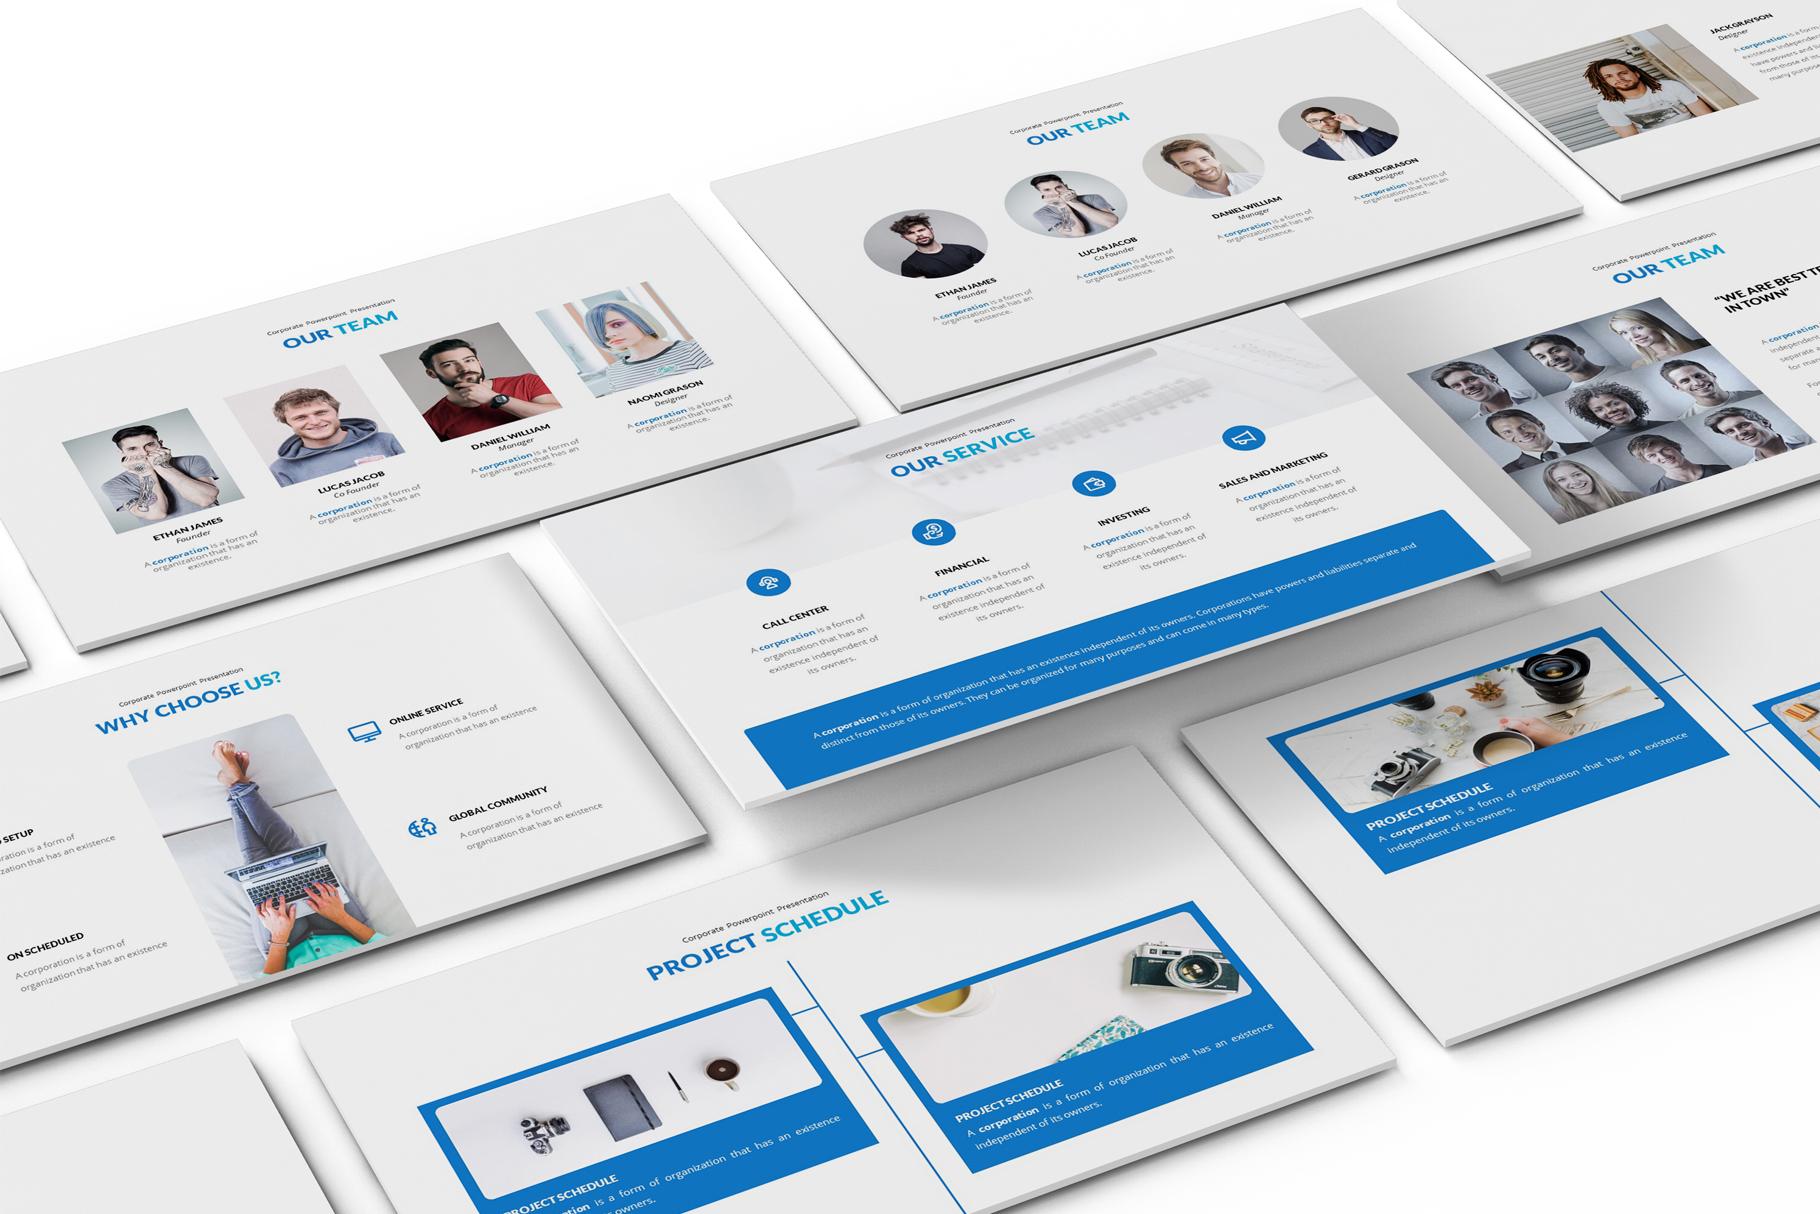 Koba Google Slides Presentation example image 4